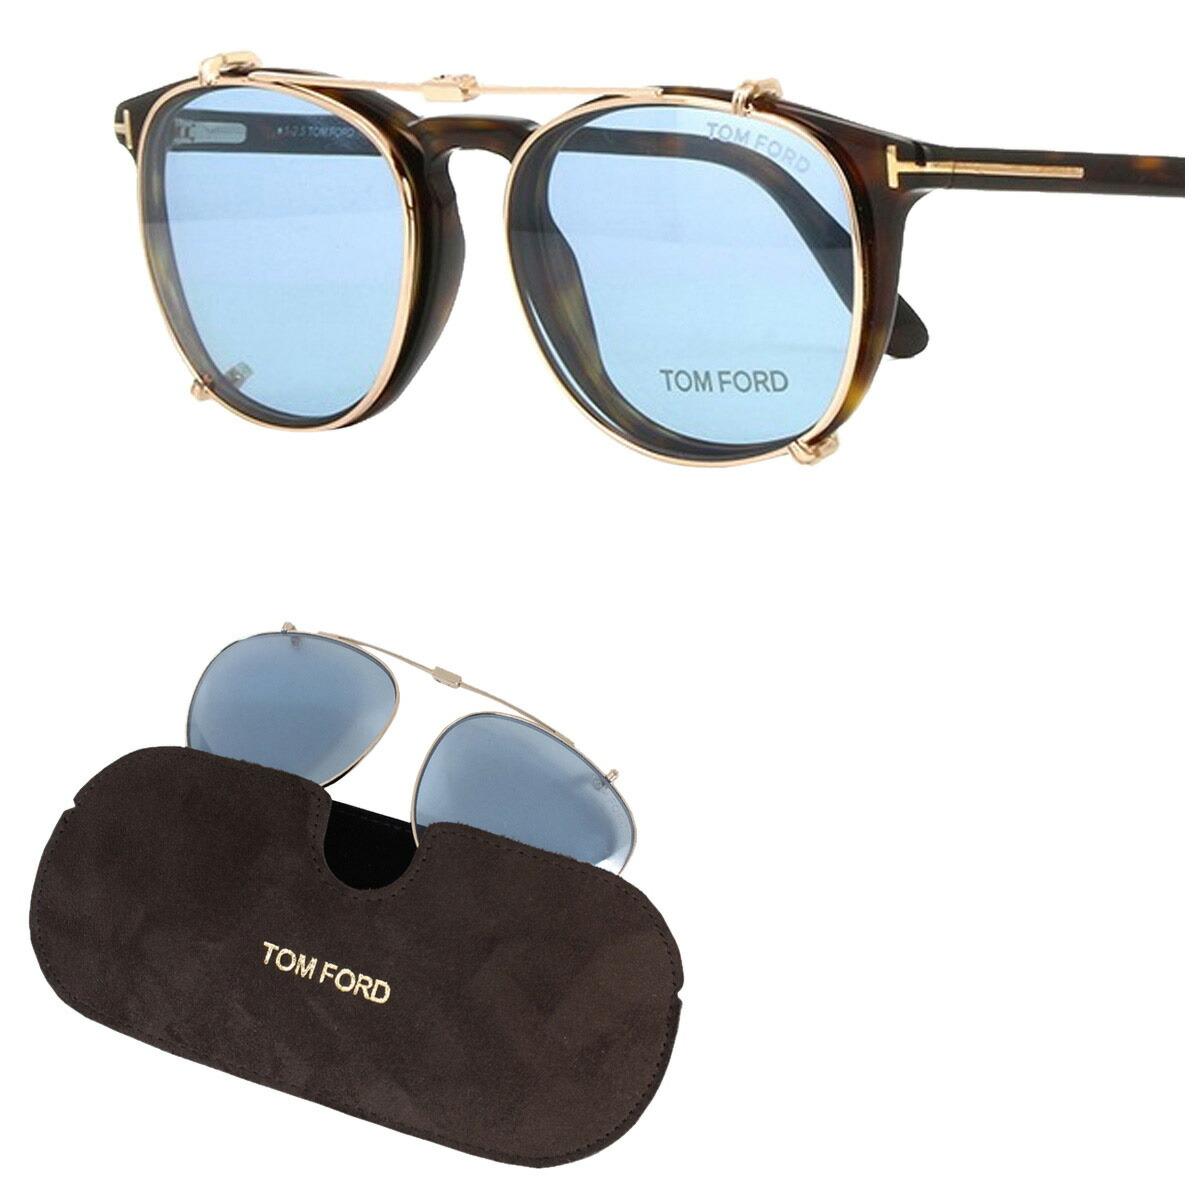 allsports rakuten global market tom ford sunglasses. Black Bedroom Furniture Sets. Home Design Ideas